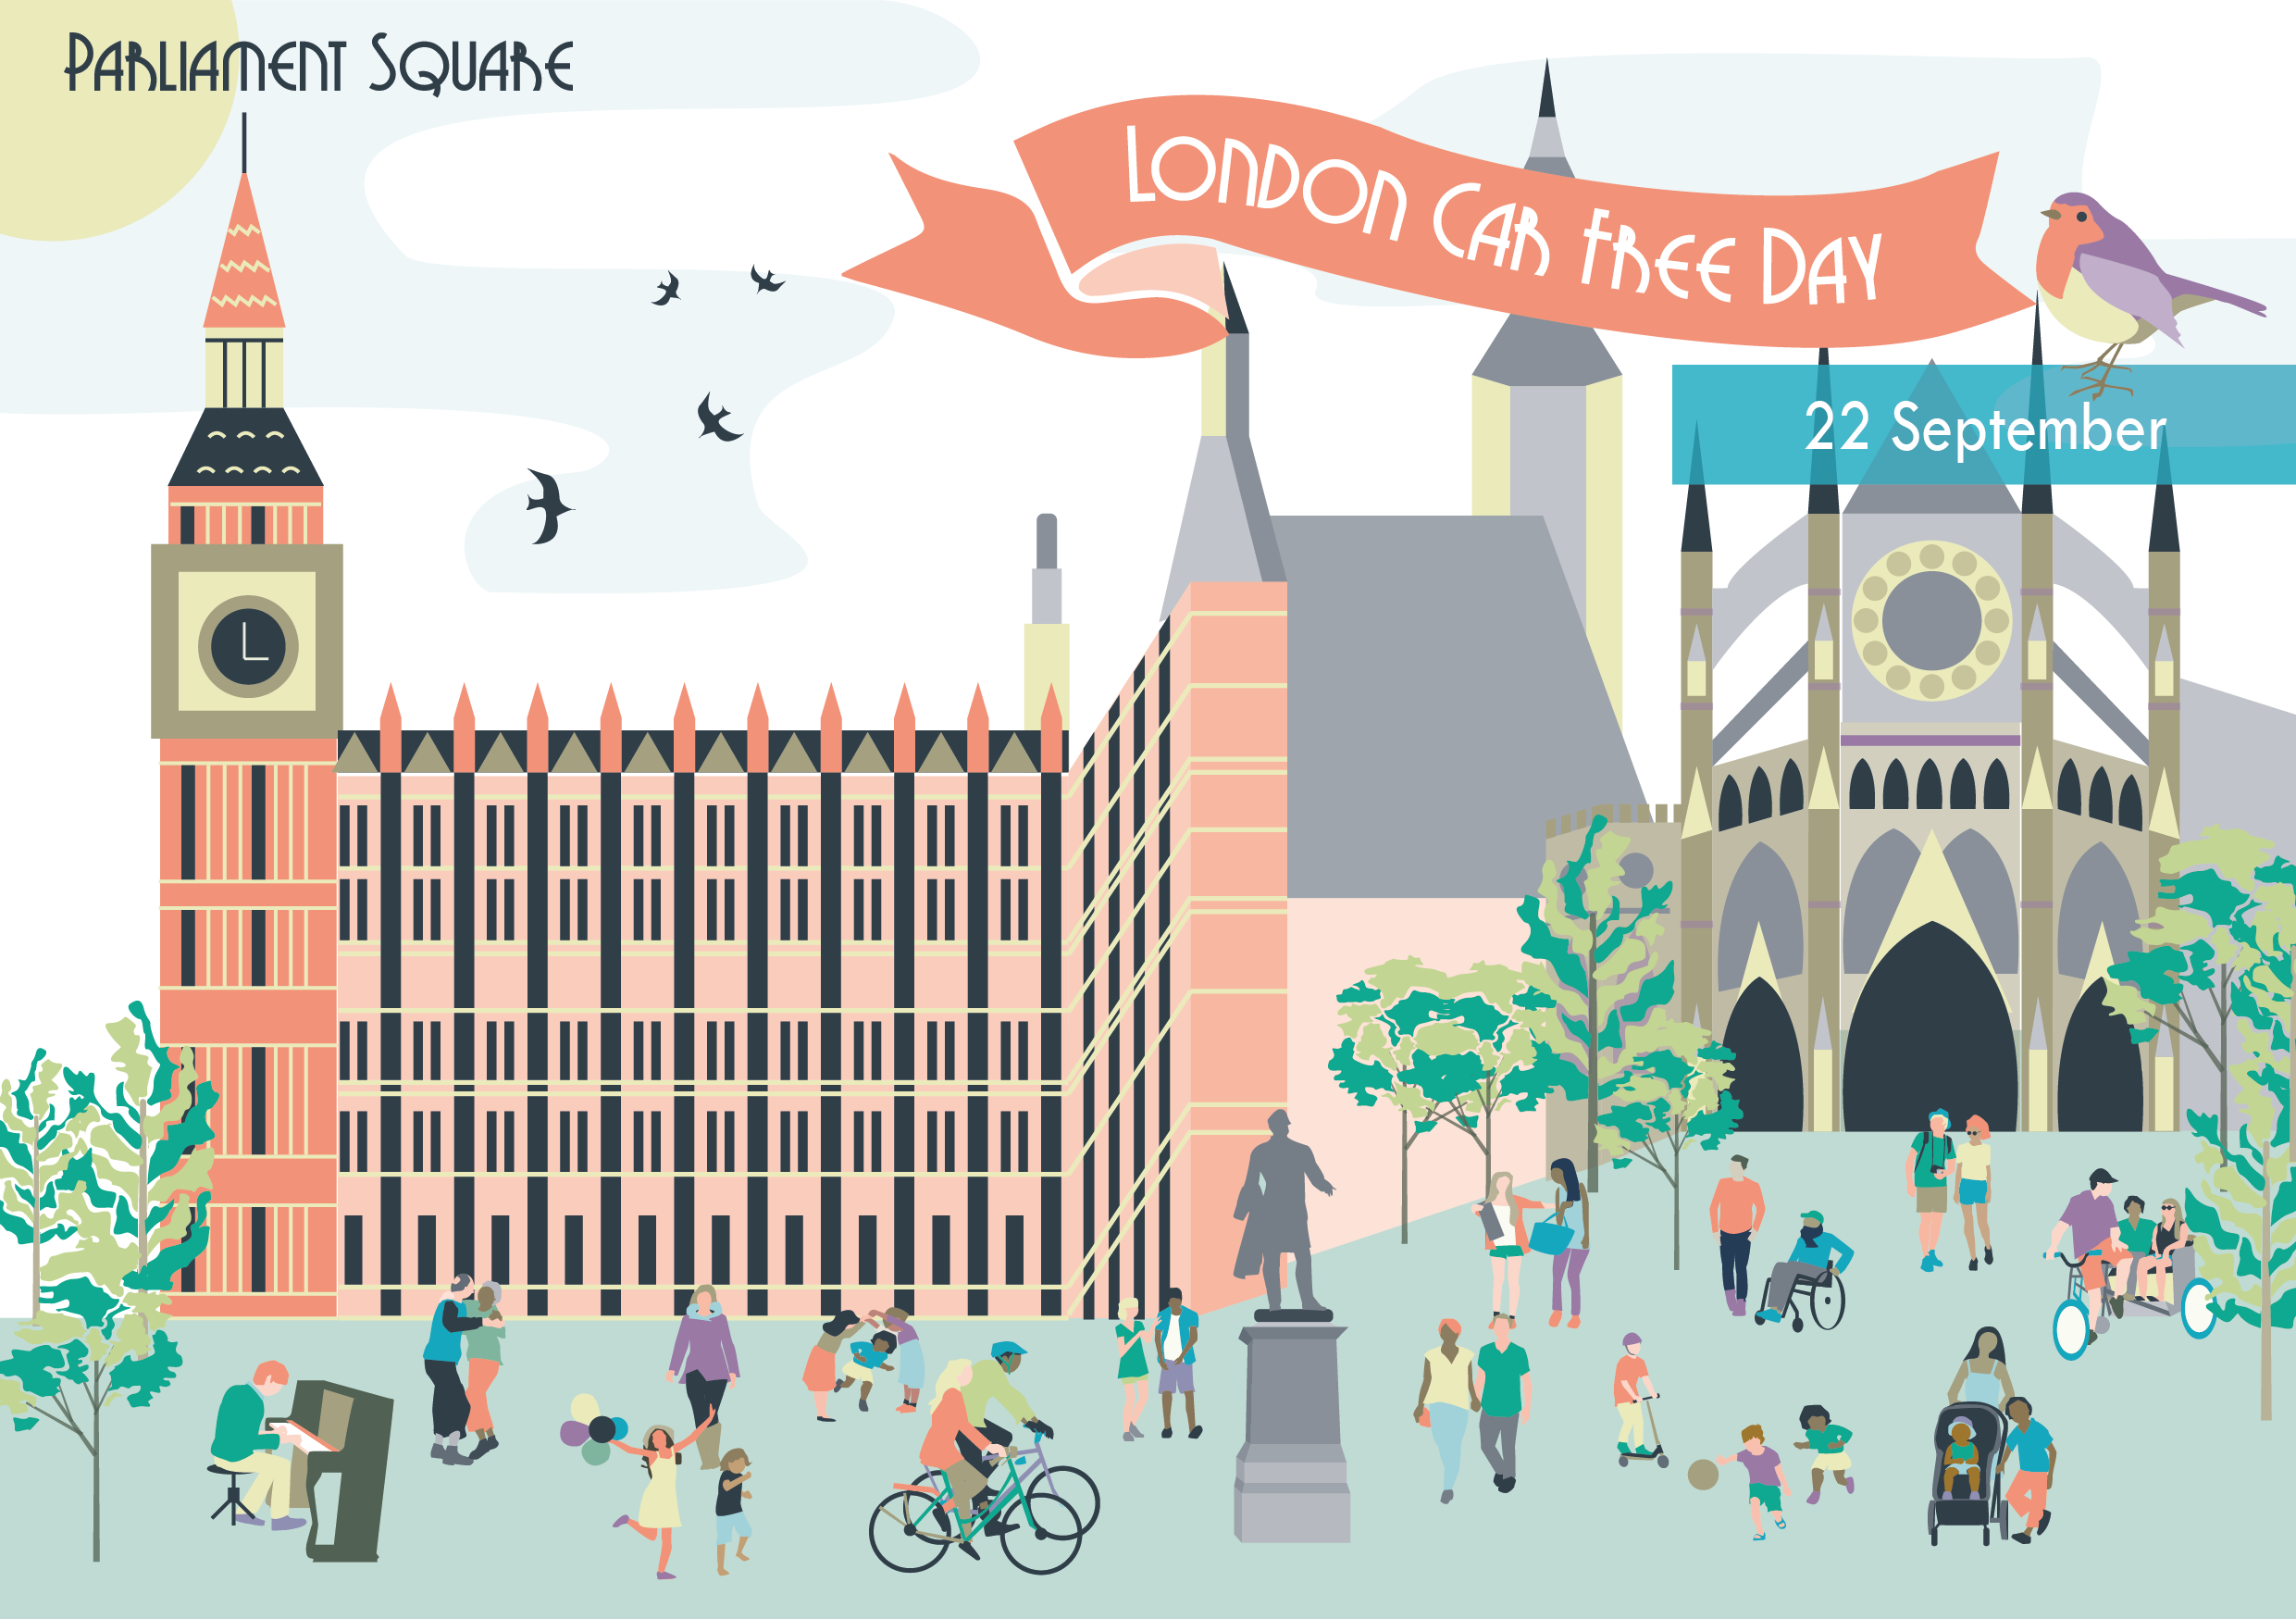 london_car_free_day_Postcards_7_Print-03.png